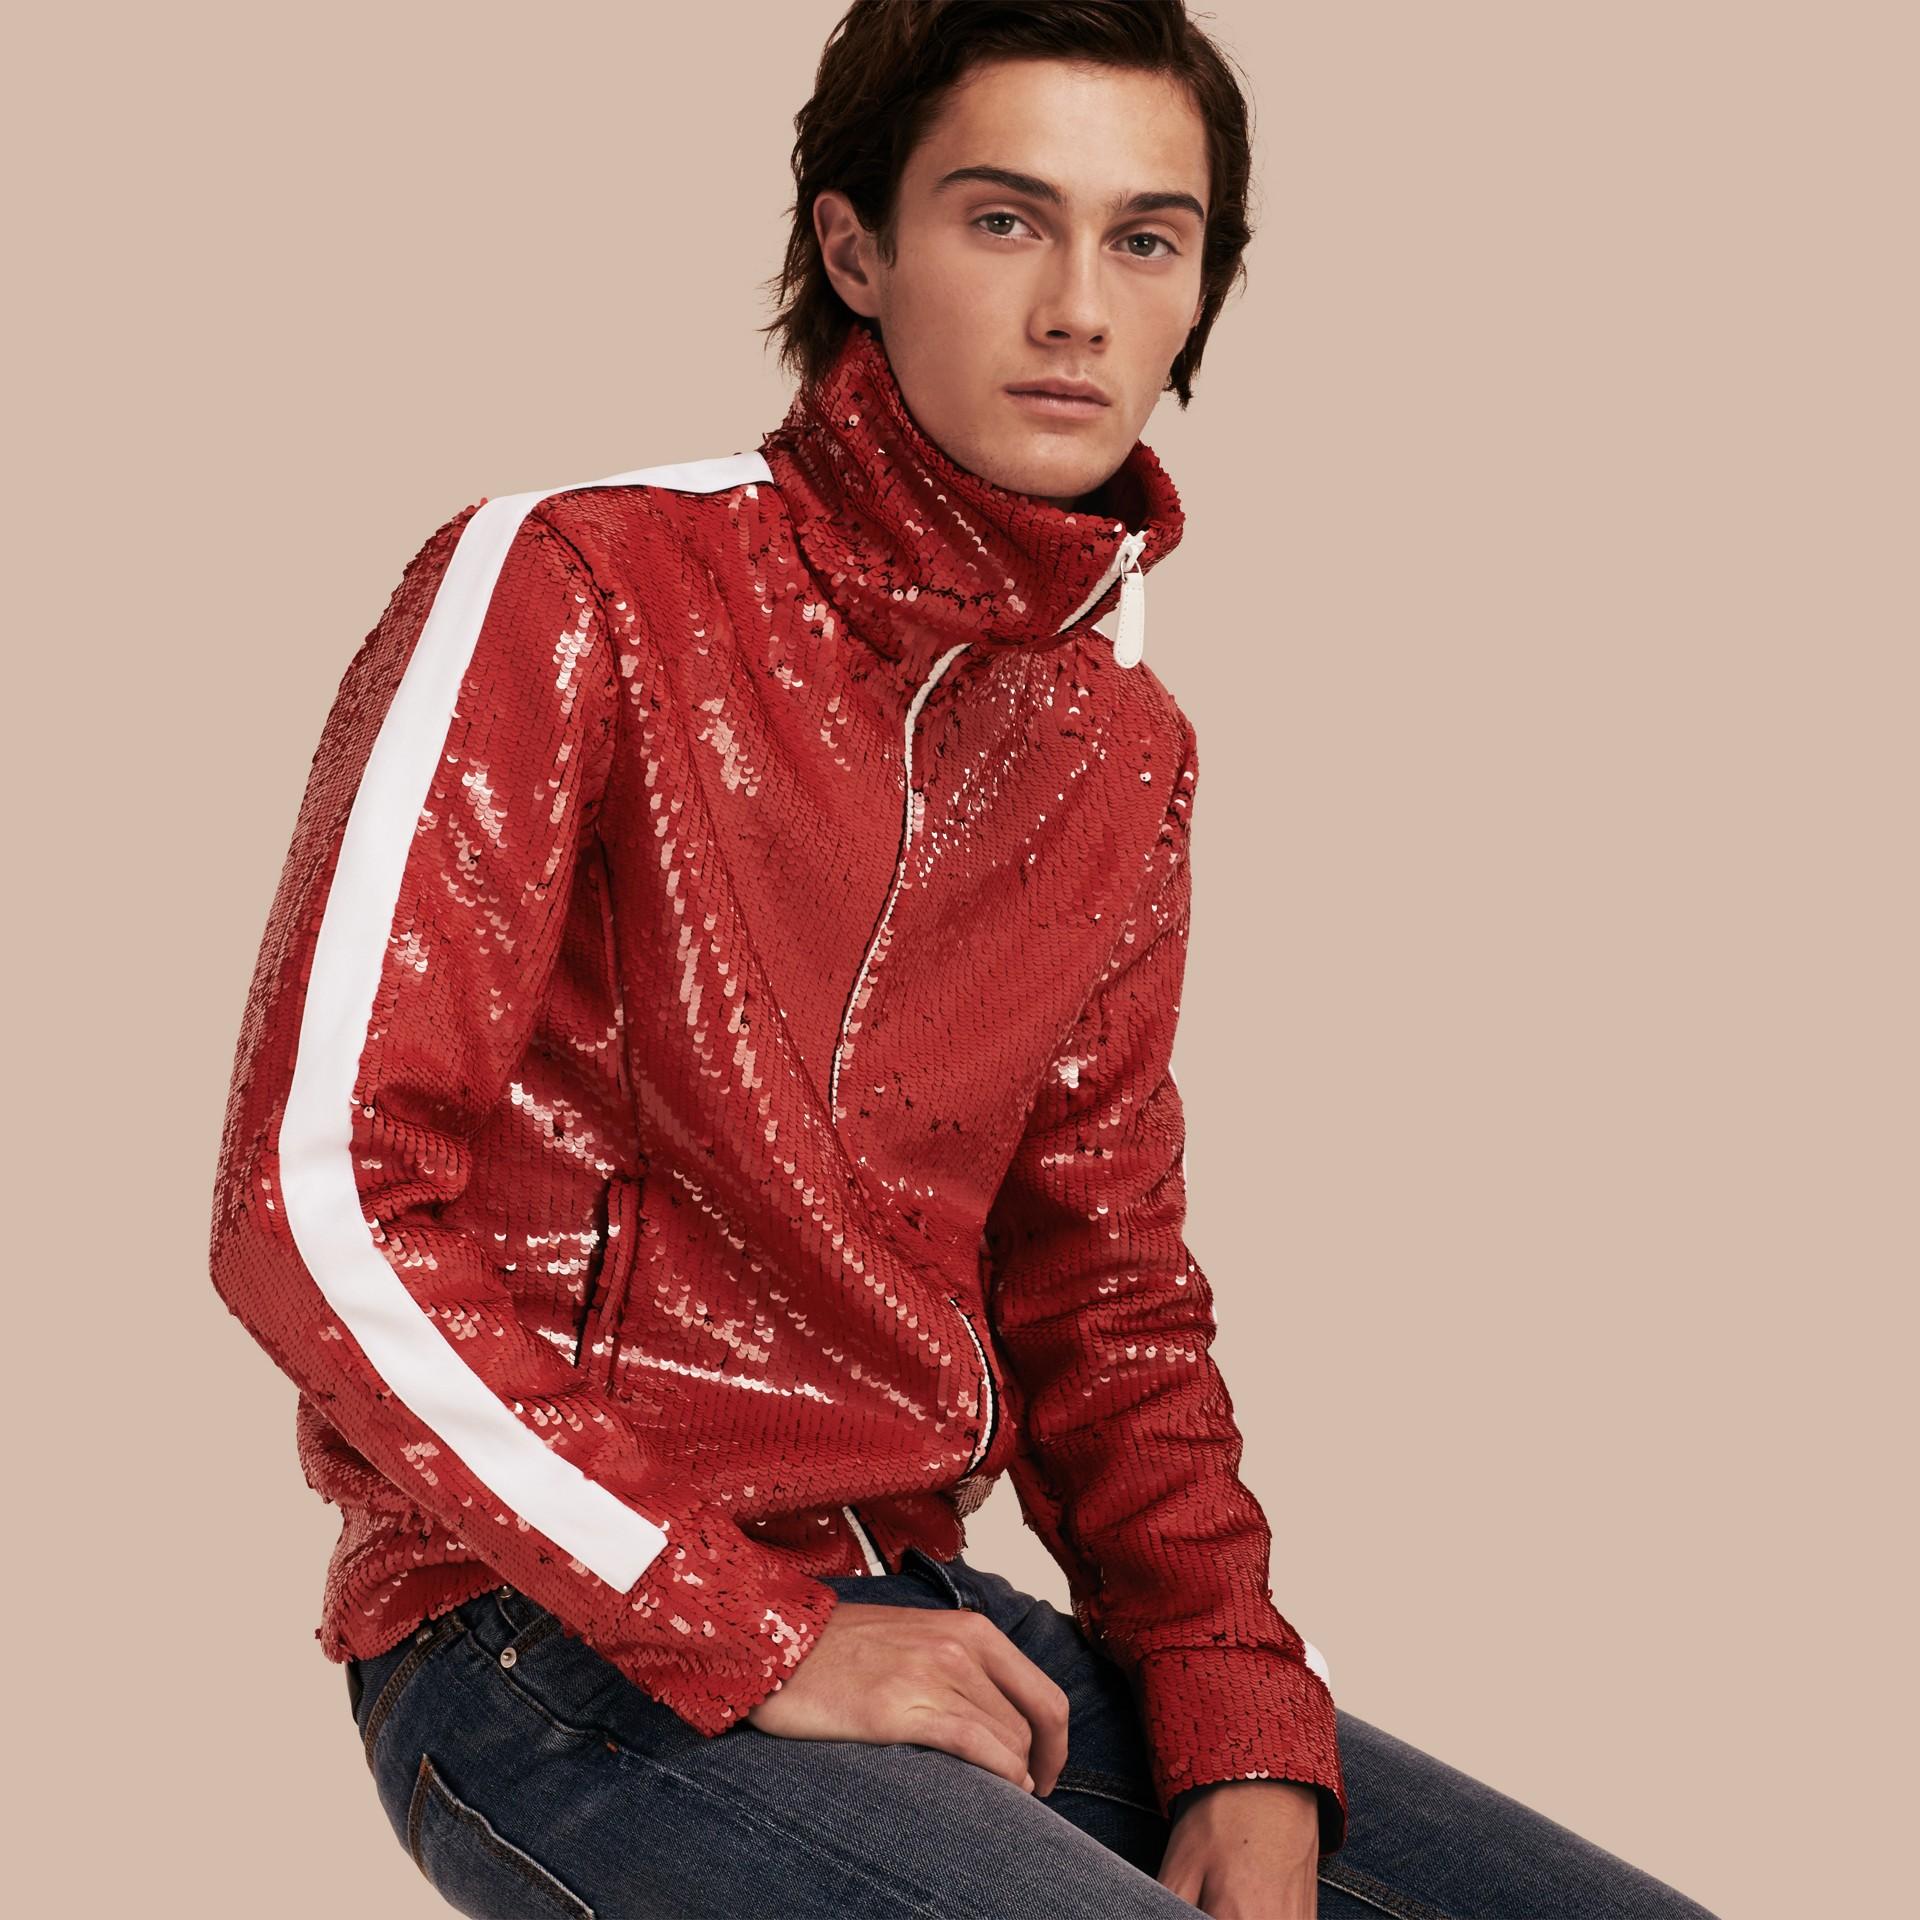 Cranberry-rot Trainingsjacke mit Pailletten - Galerie-Bild 1